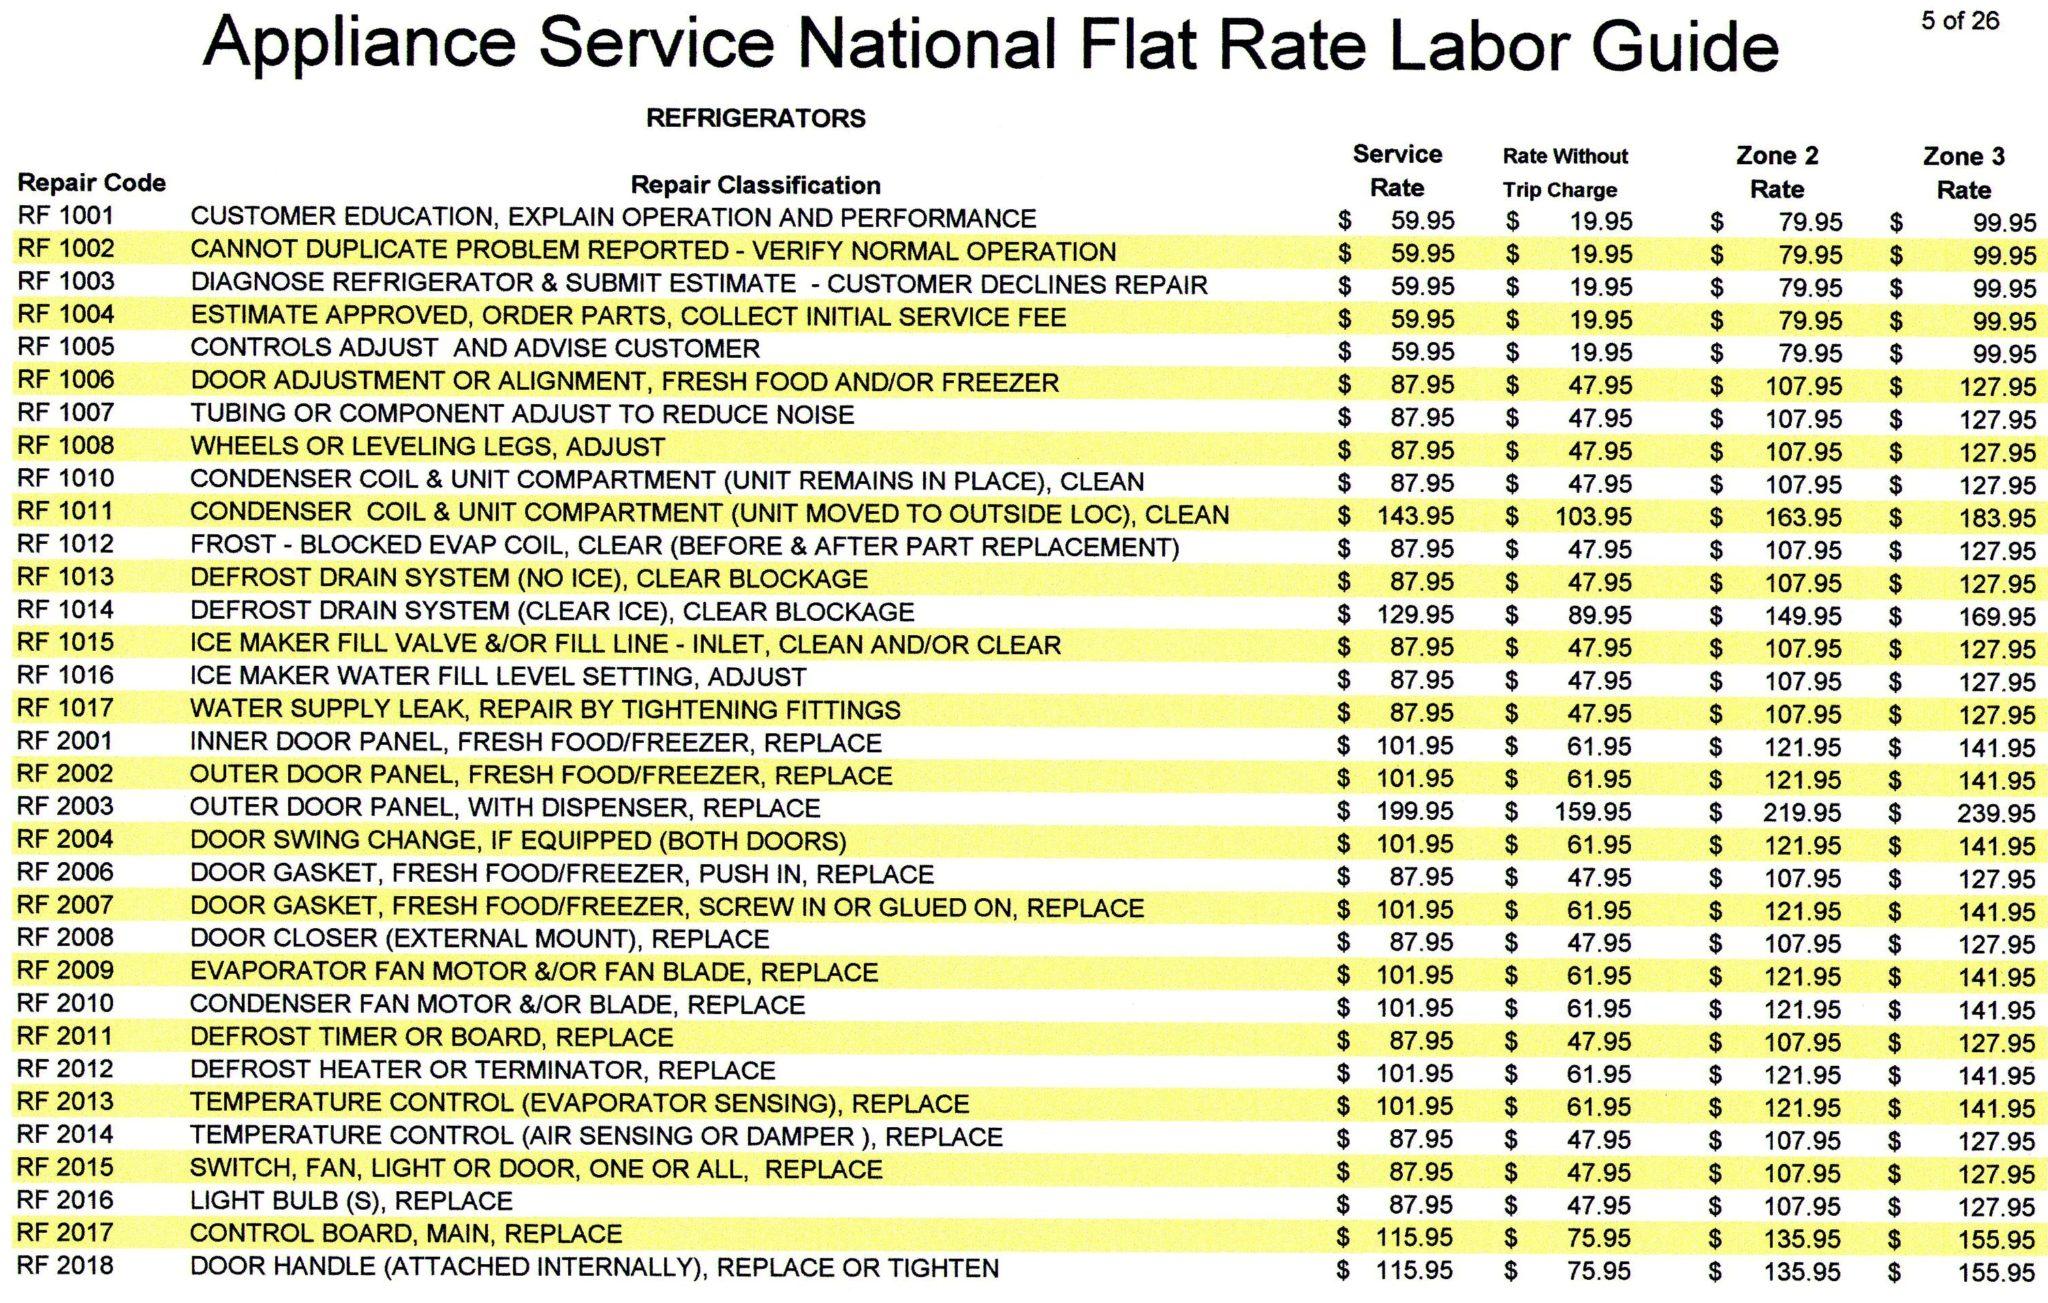 Appl Serv Nat Flat Rate Guide Sample Page2